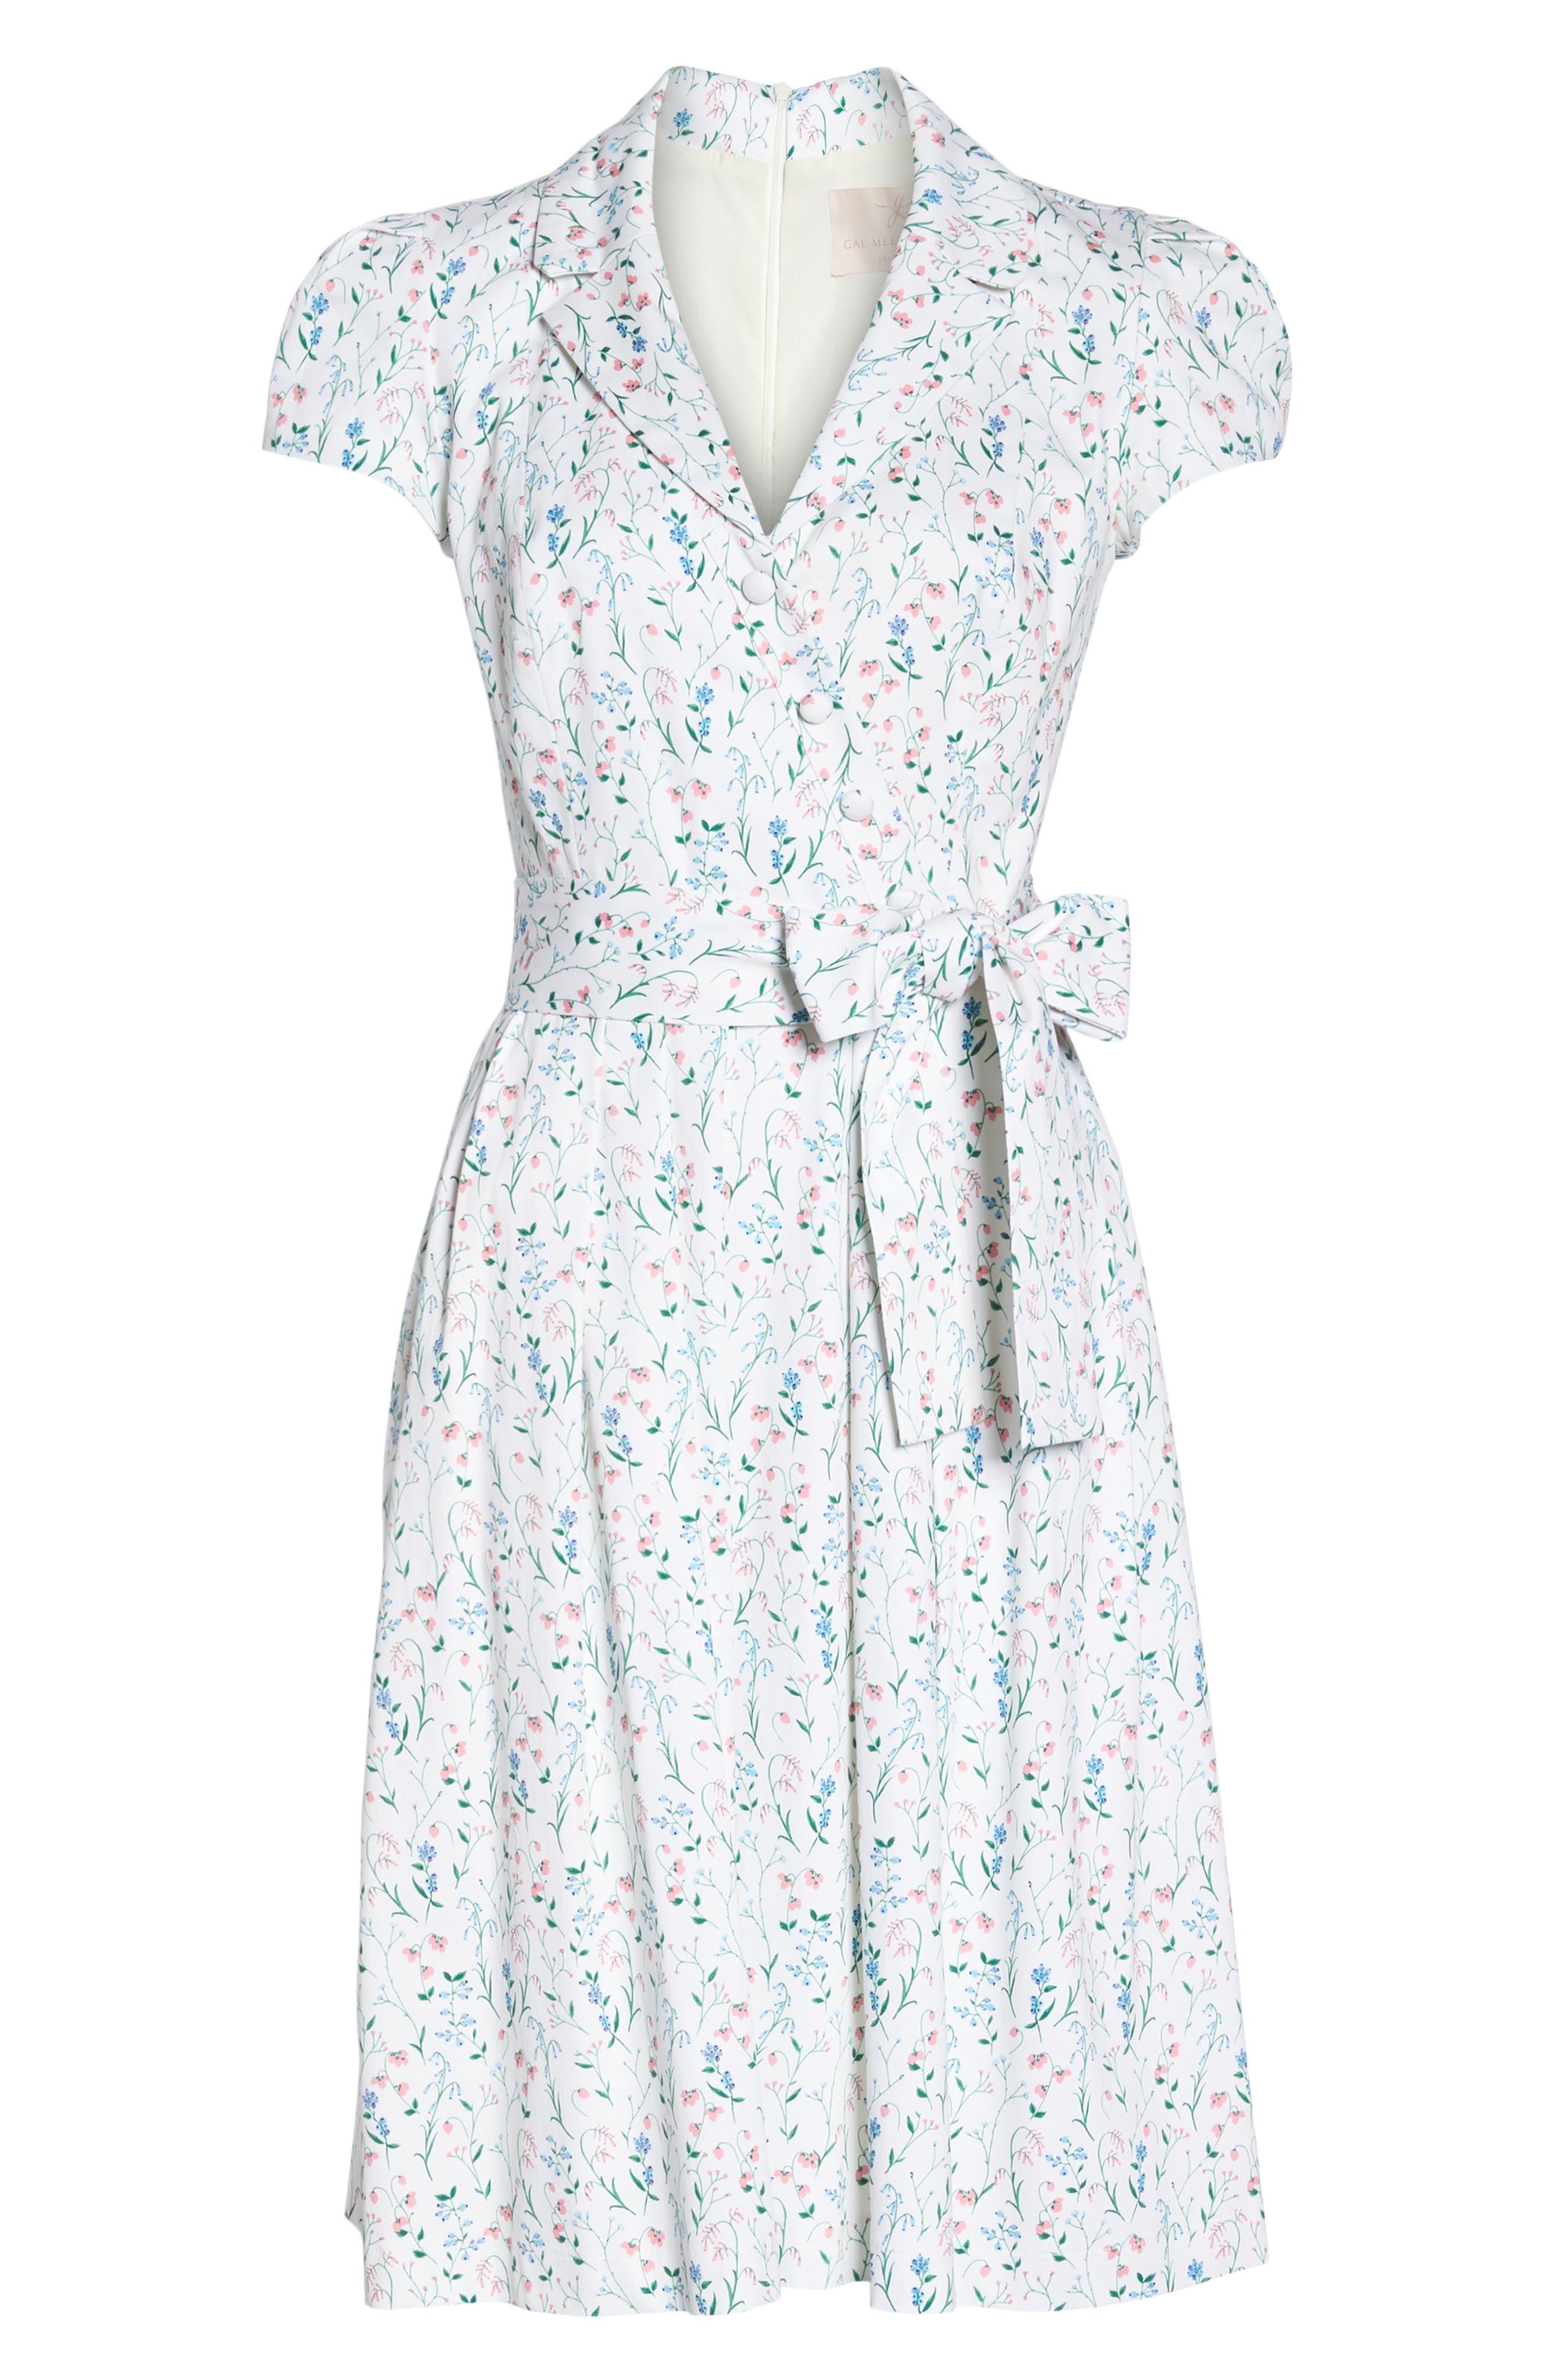 Anne Spring Sprig Print Wrap Style Dress,                             Alternate thumbnail 8, color,                             Pink